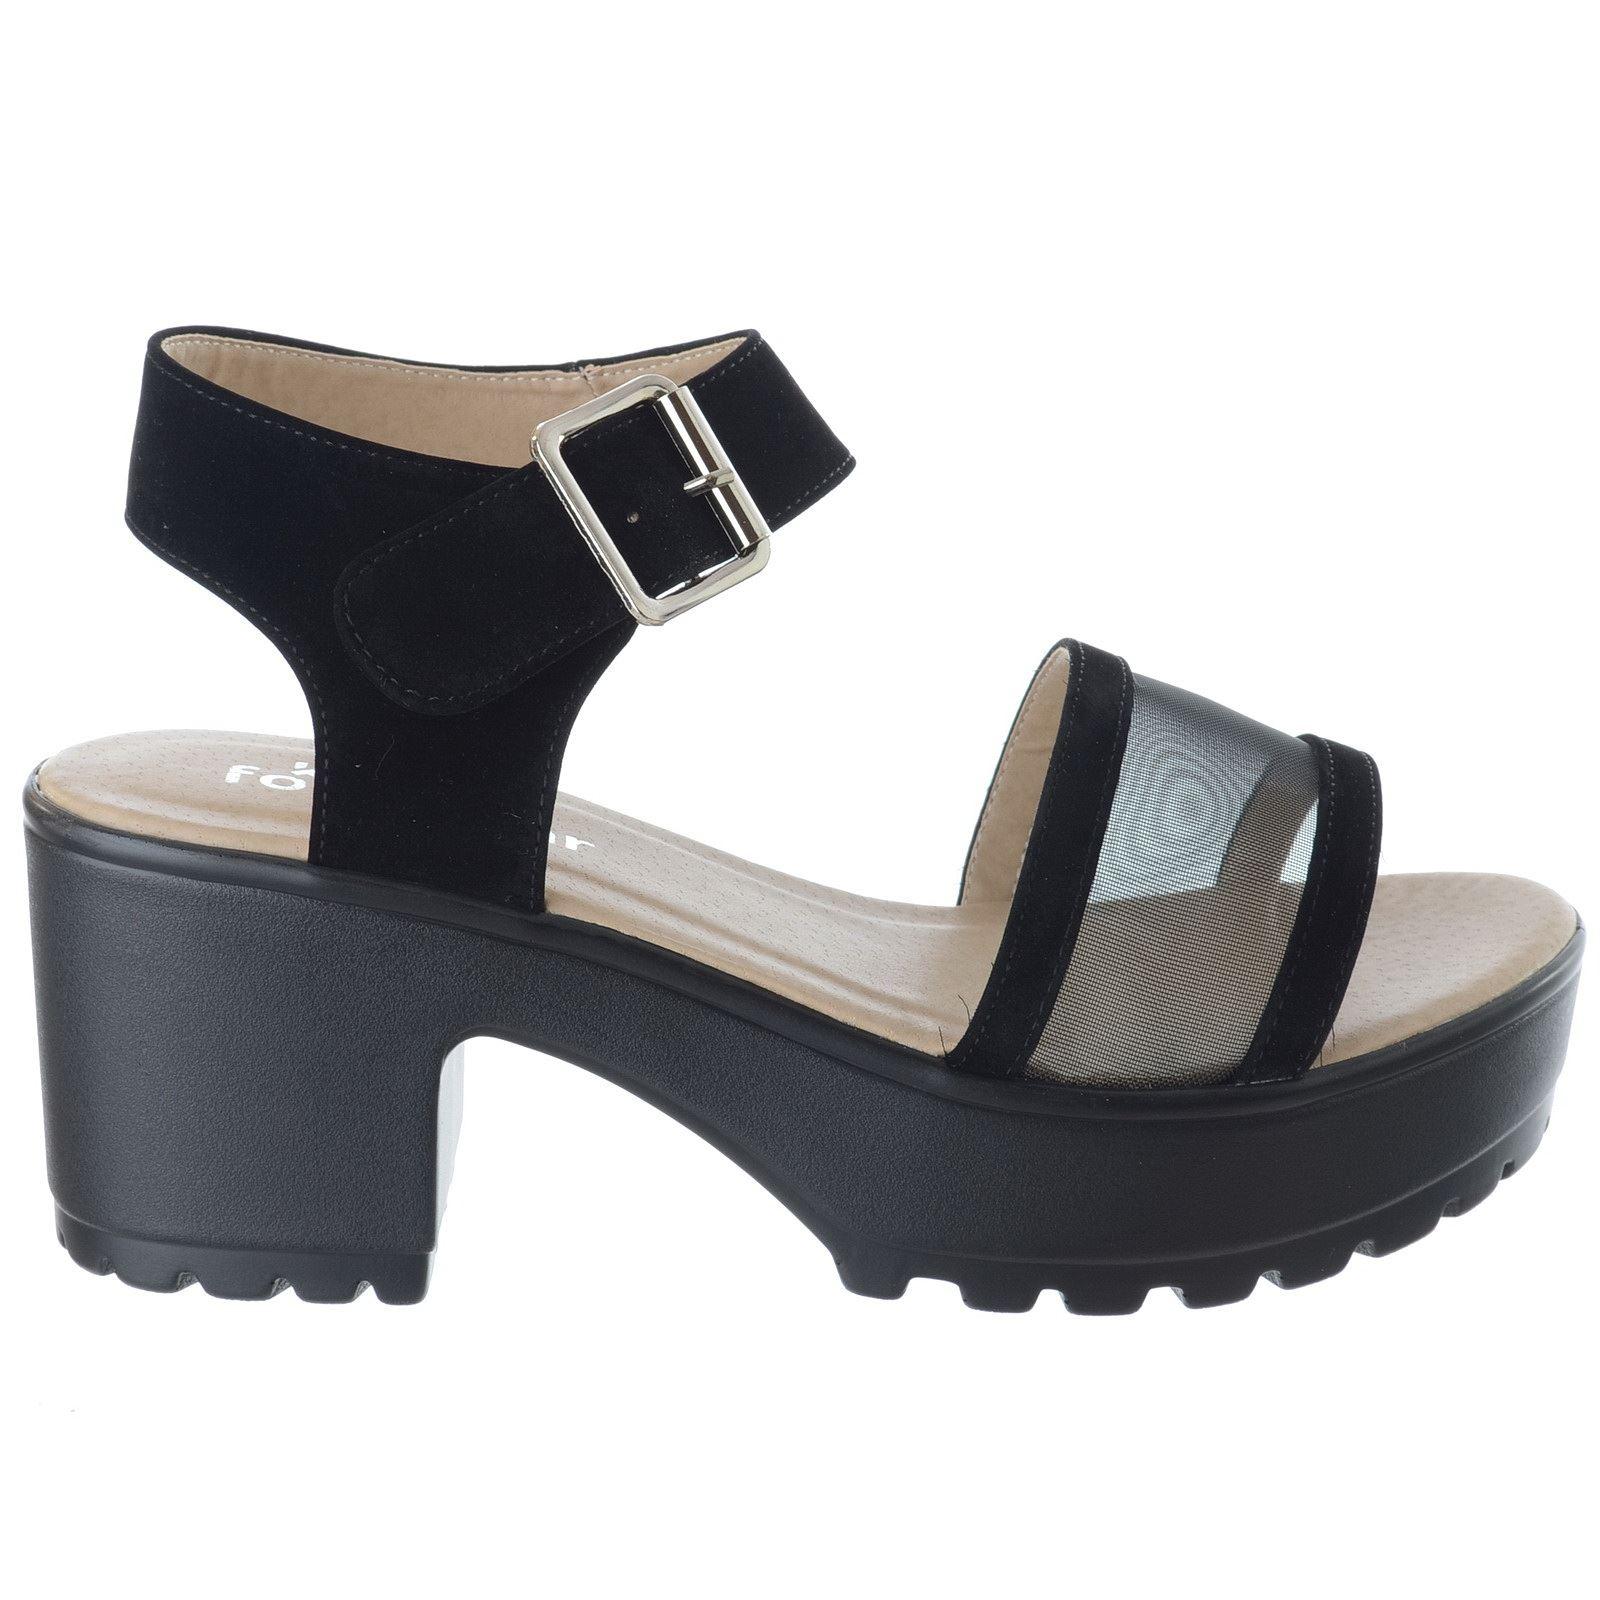 Womens Ladies Low Mid Block Heel Ankle Strap Mesh Platform Sandals Shoes Size